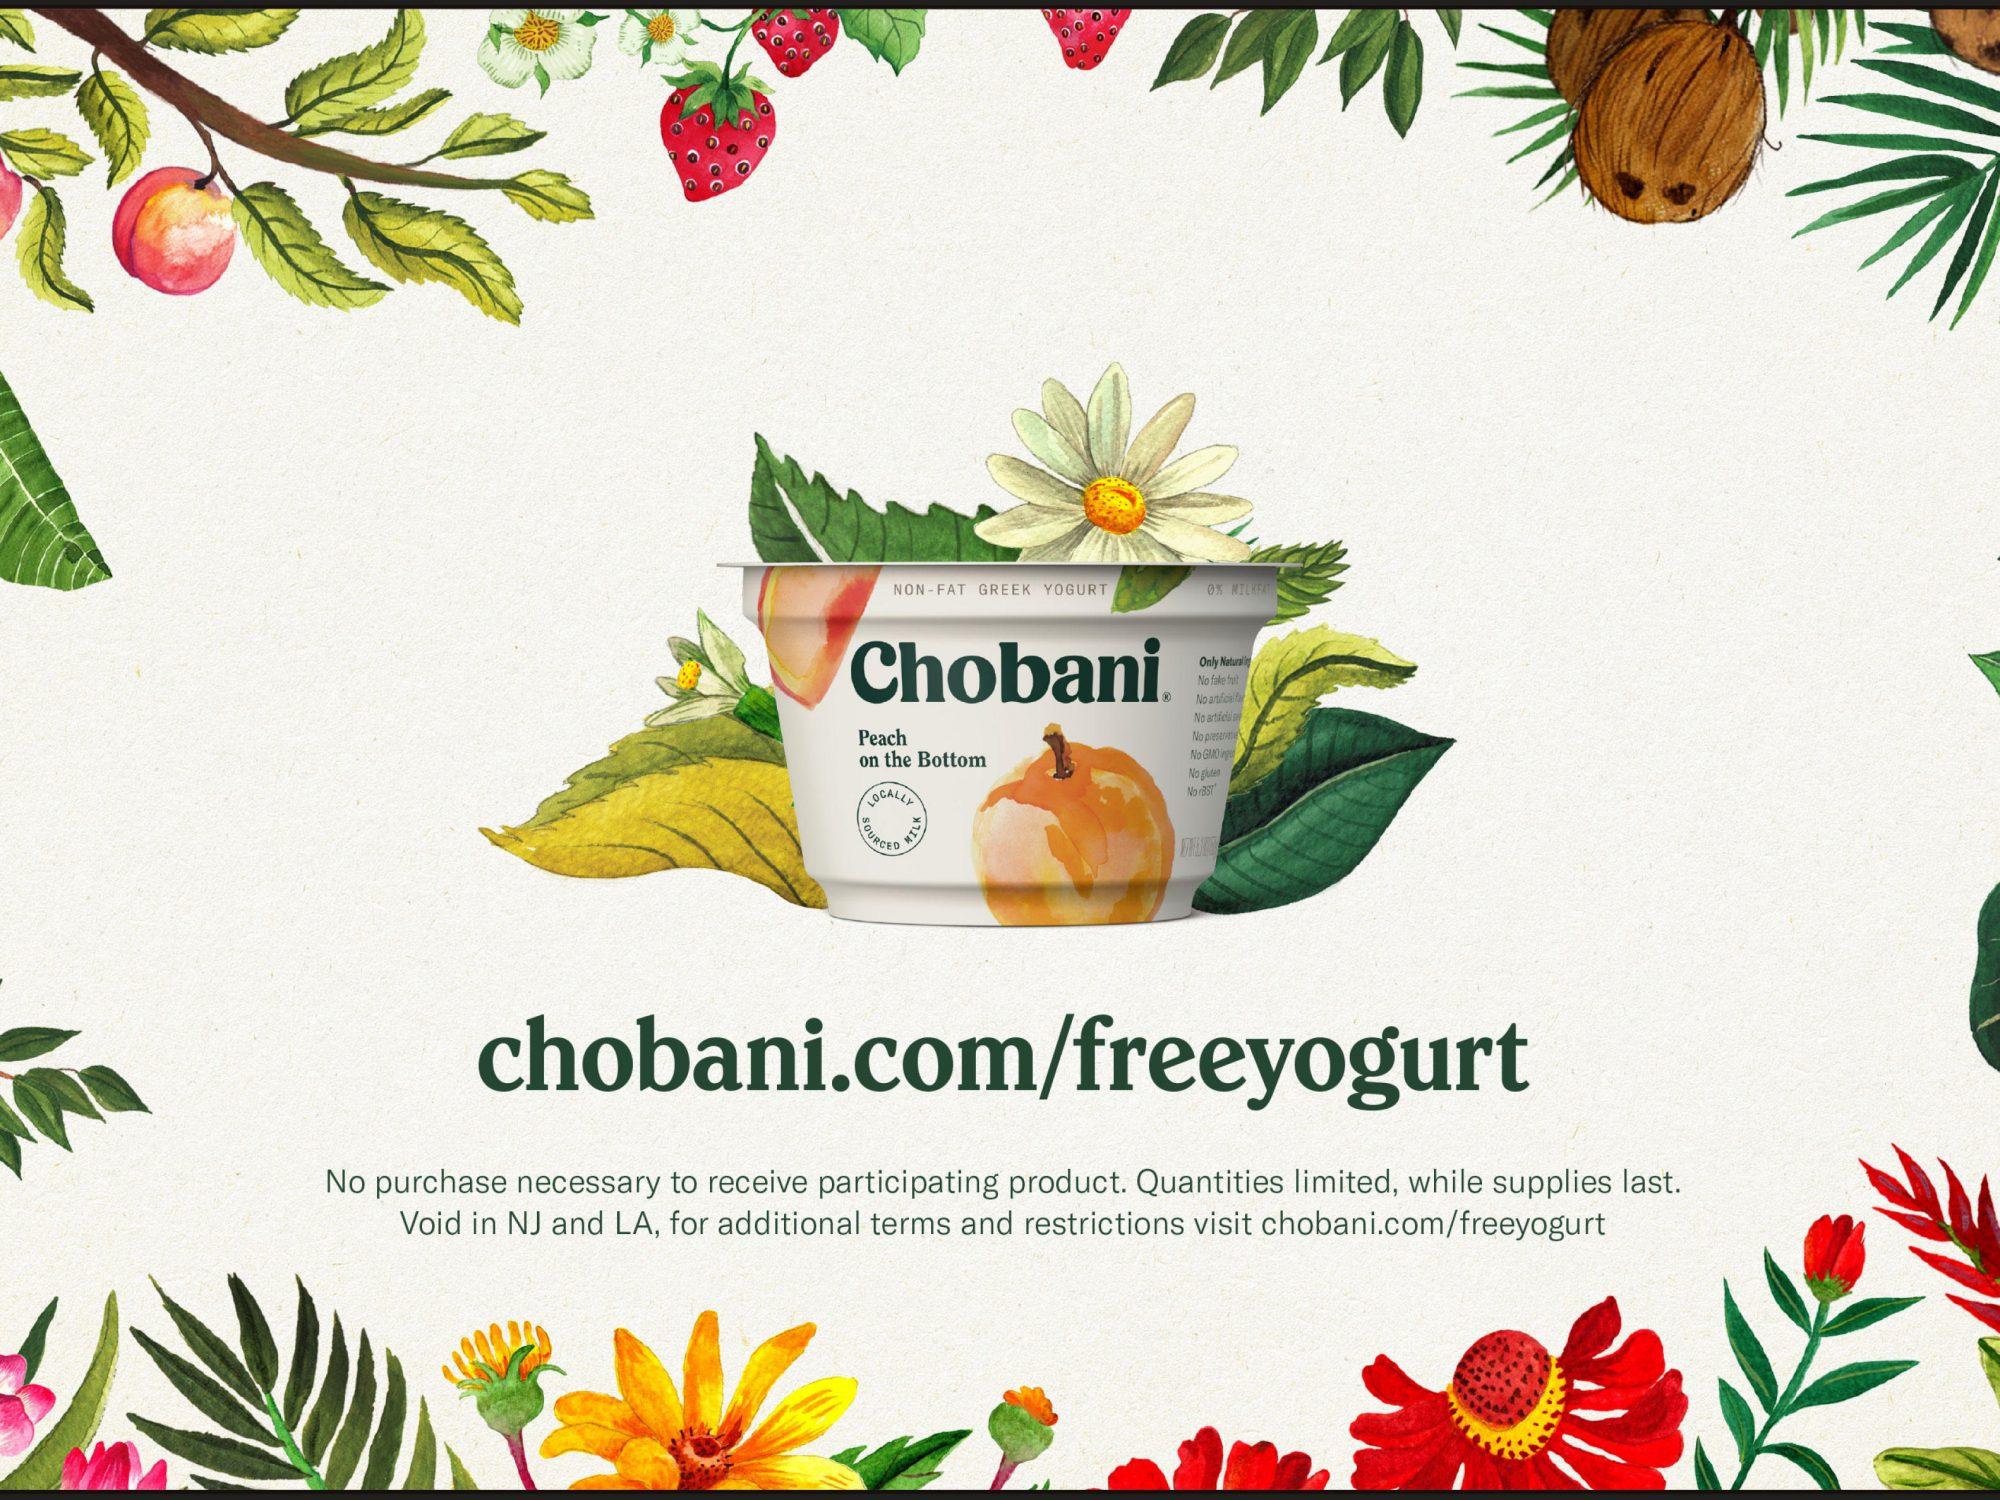 Chobani Is Giving Away Free Yogurt for Their 10th Anniversary 1802w-Chobani-Coupon